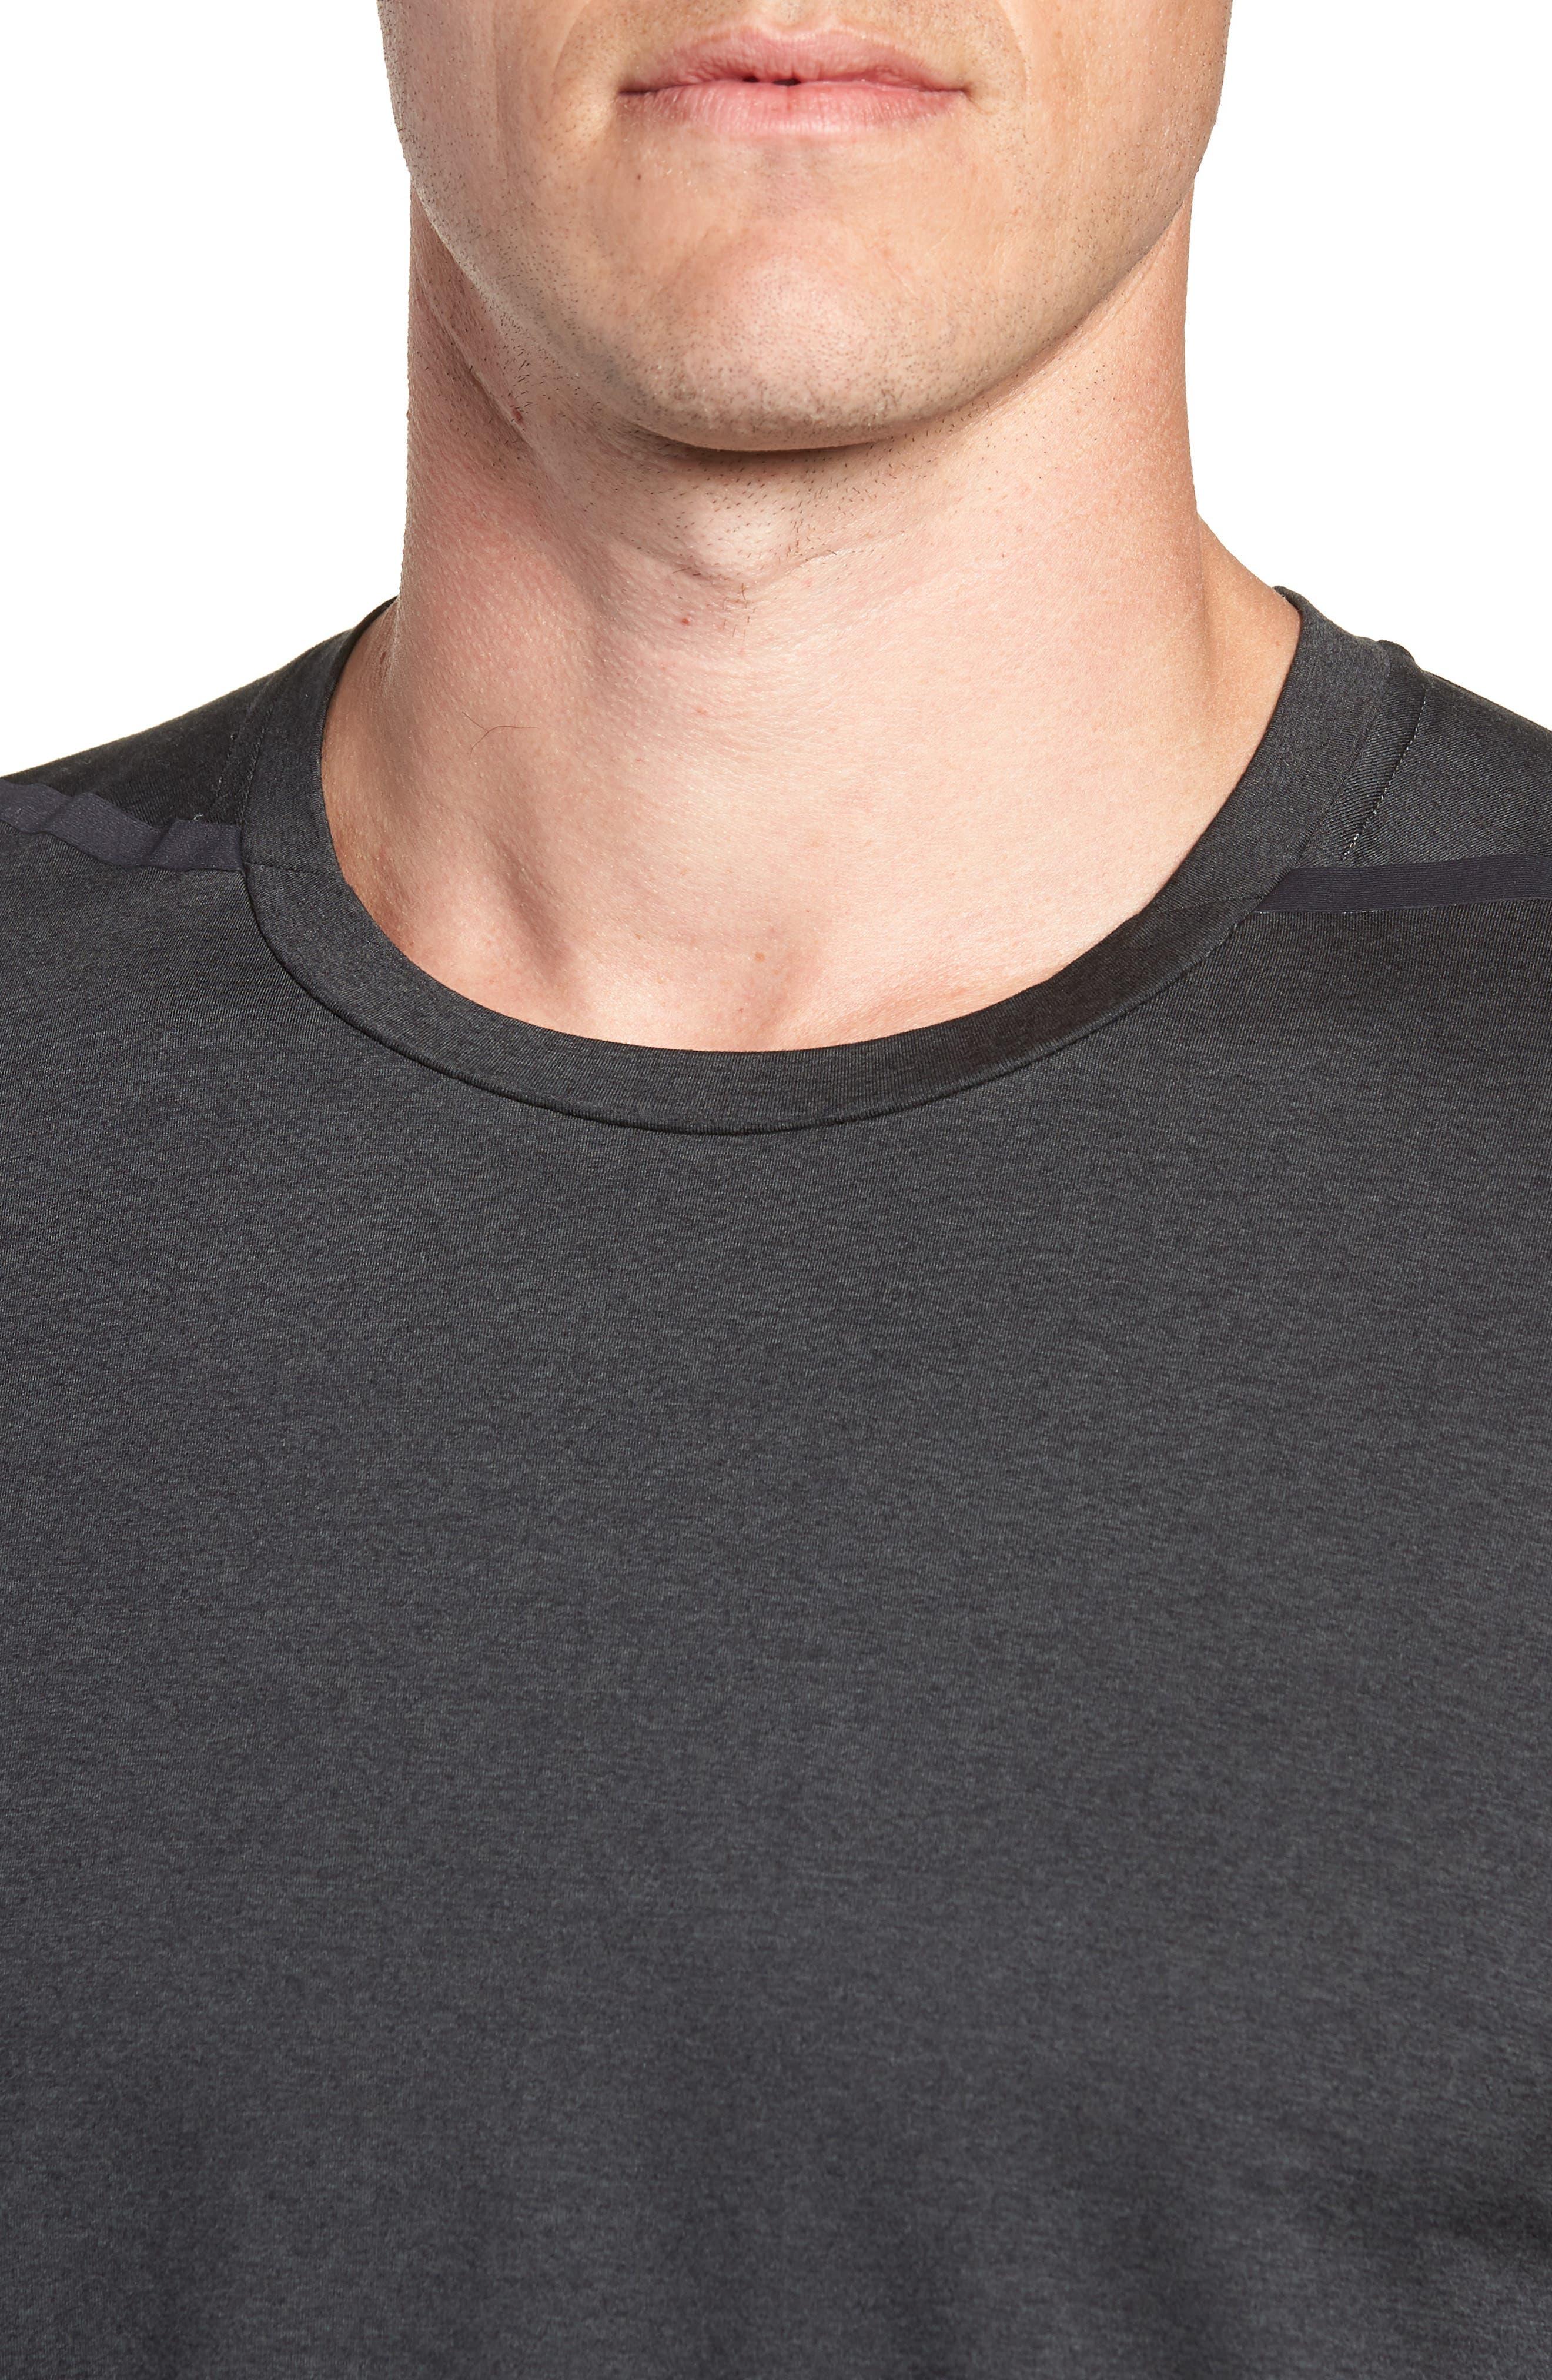 Dry Max Training T-Shirt,                             Alternate thumbnail 4, color,                             BLACK/ ANTHRACITE/ COBALT